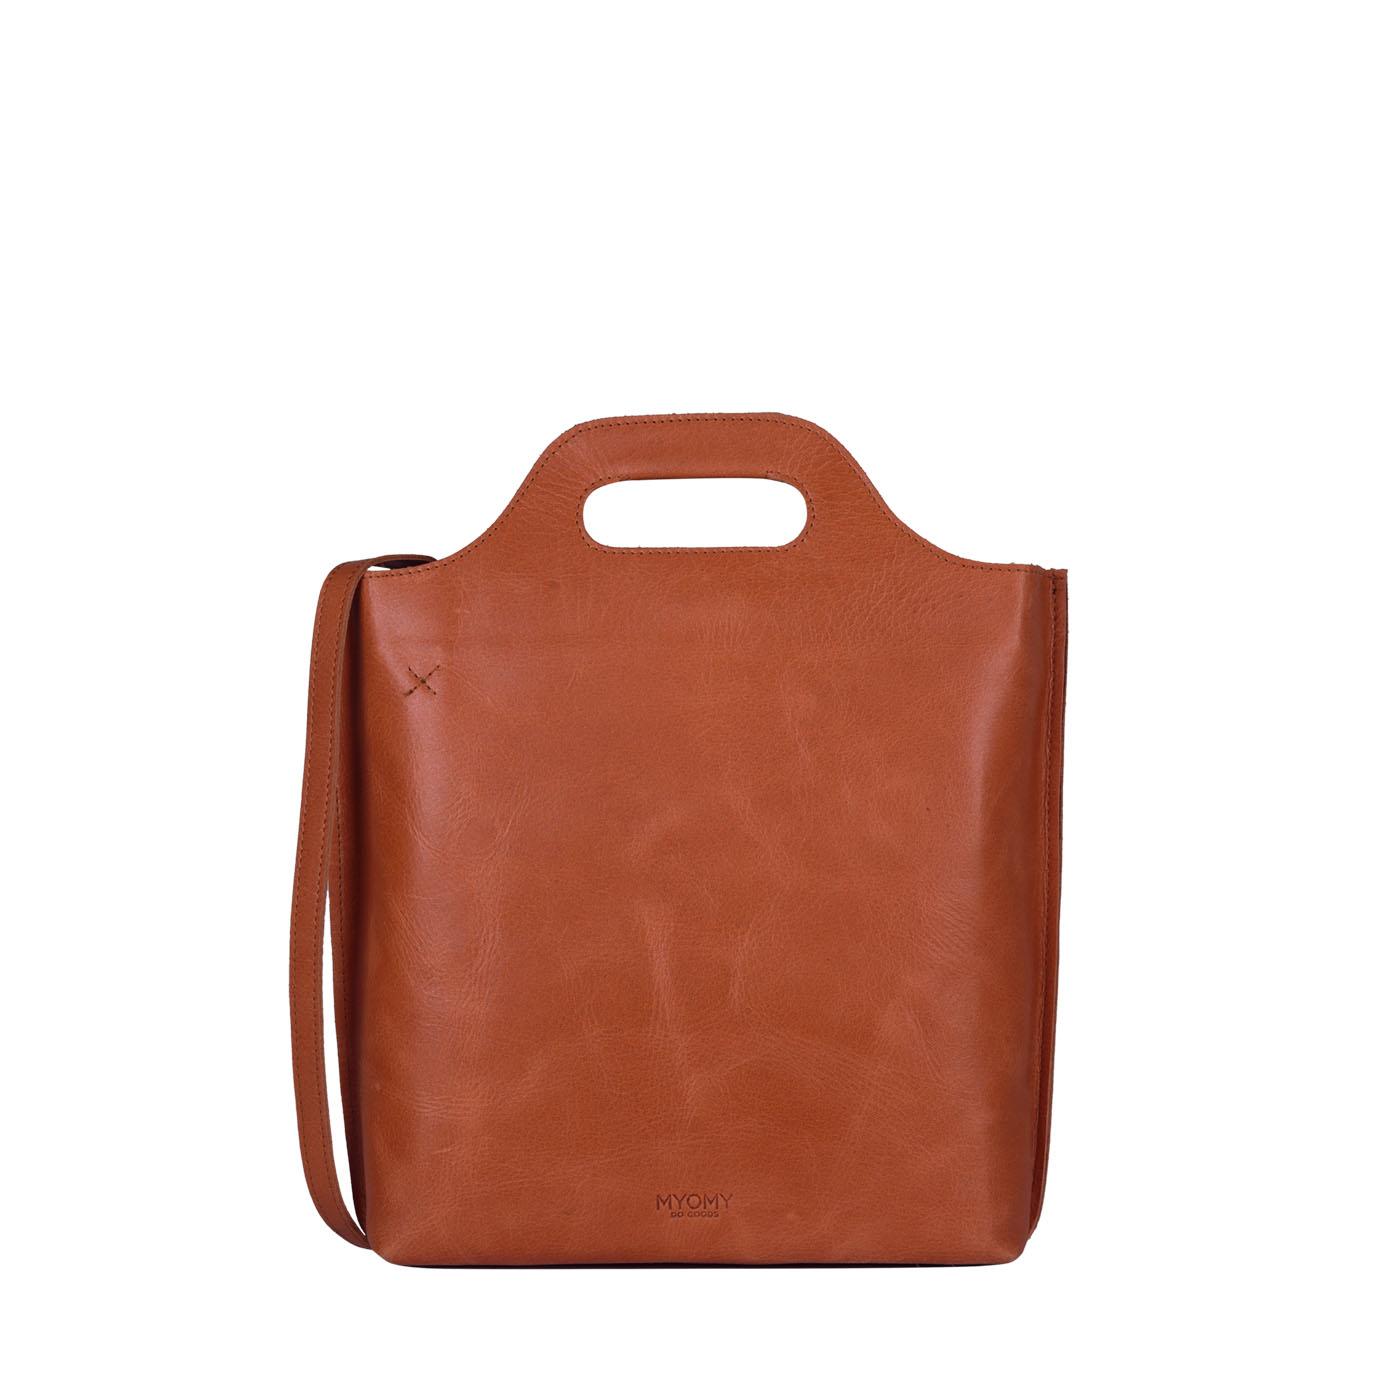 MY CARRY BAG shopper medium - hunter waxy ginger